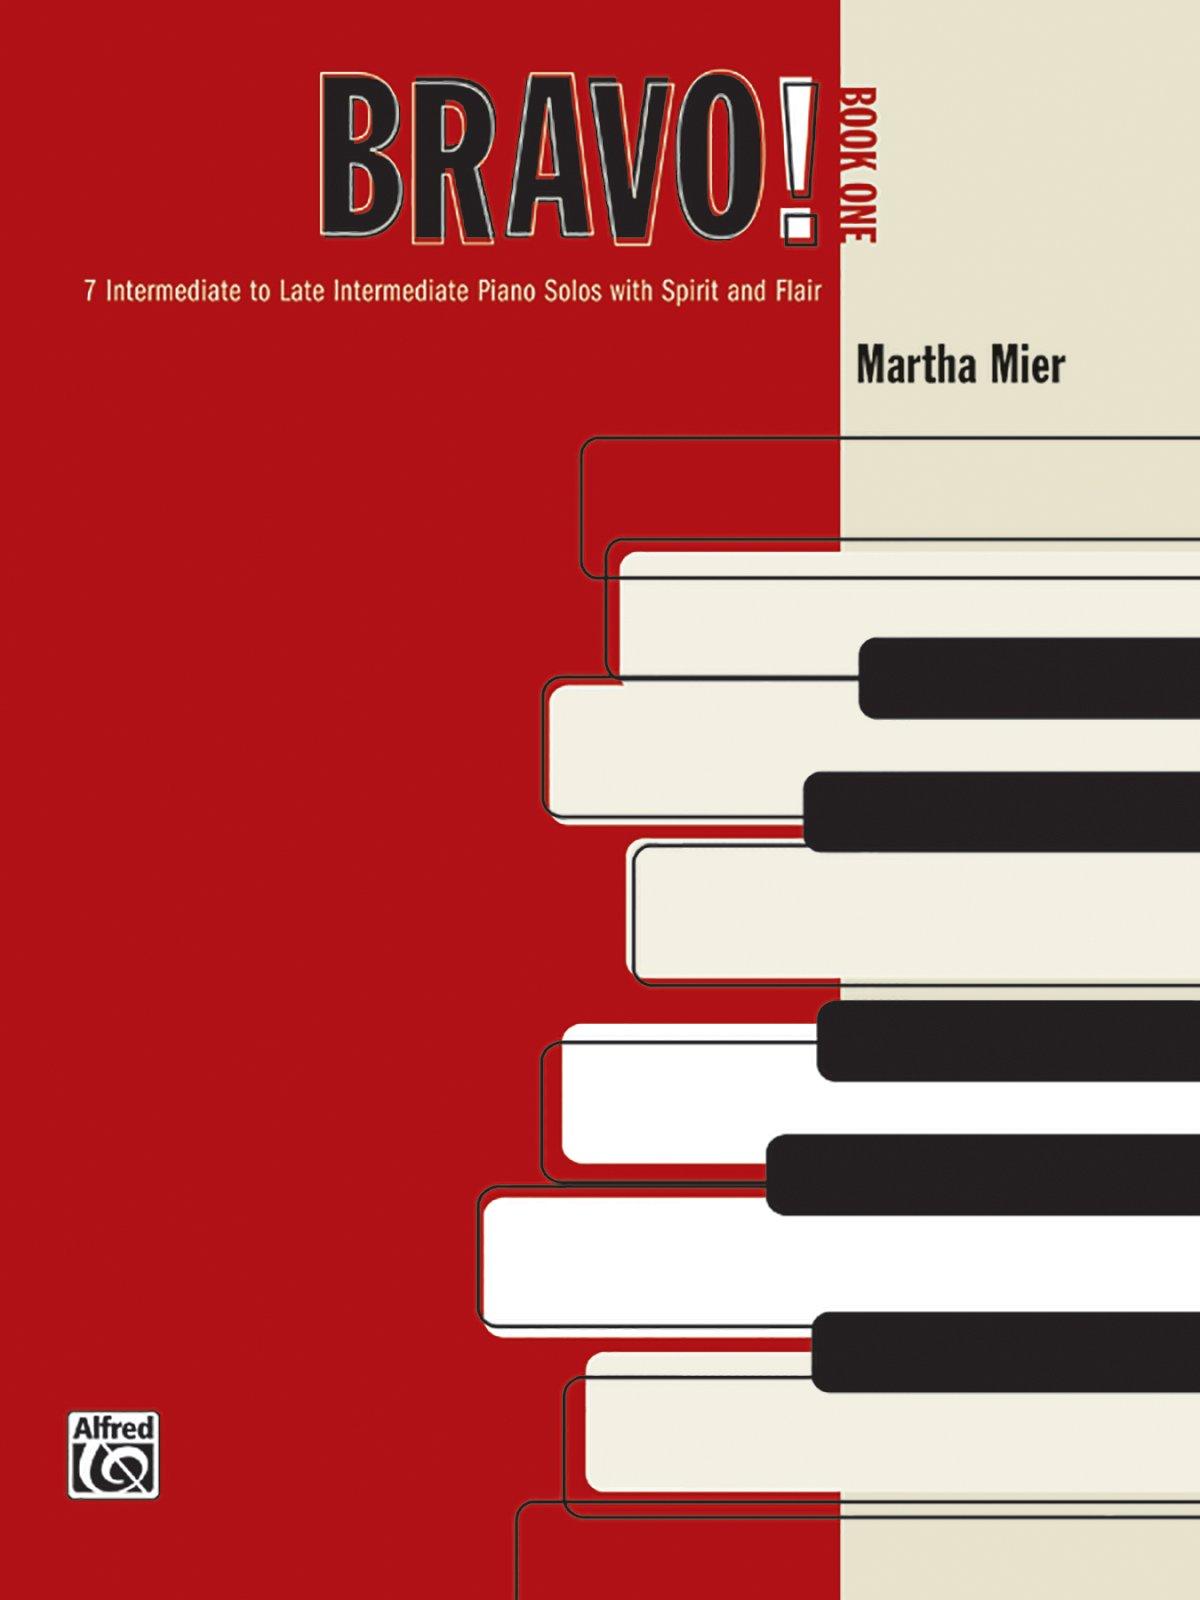 Bravo!, Bk 1: 7 Intermediate to Late Intermediate Piano Solos with Spirit and Flair PDF